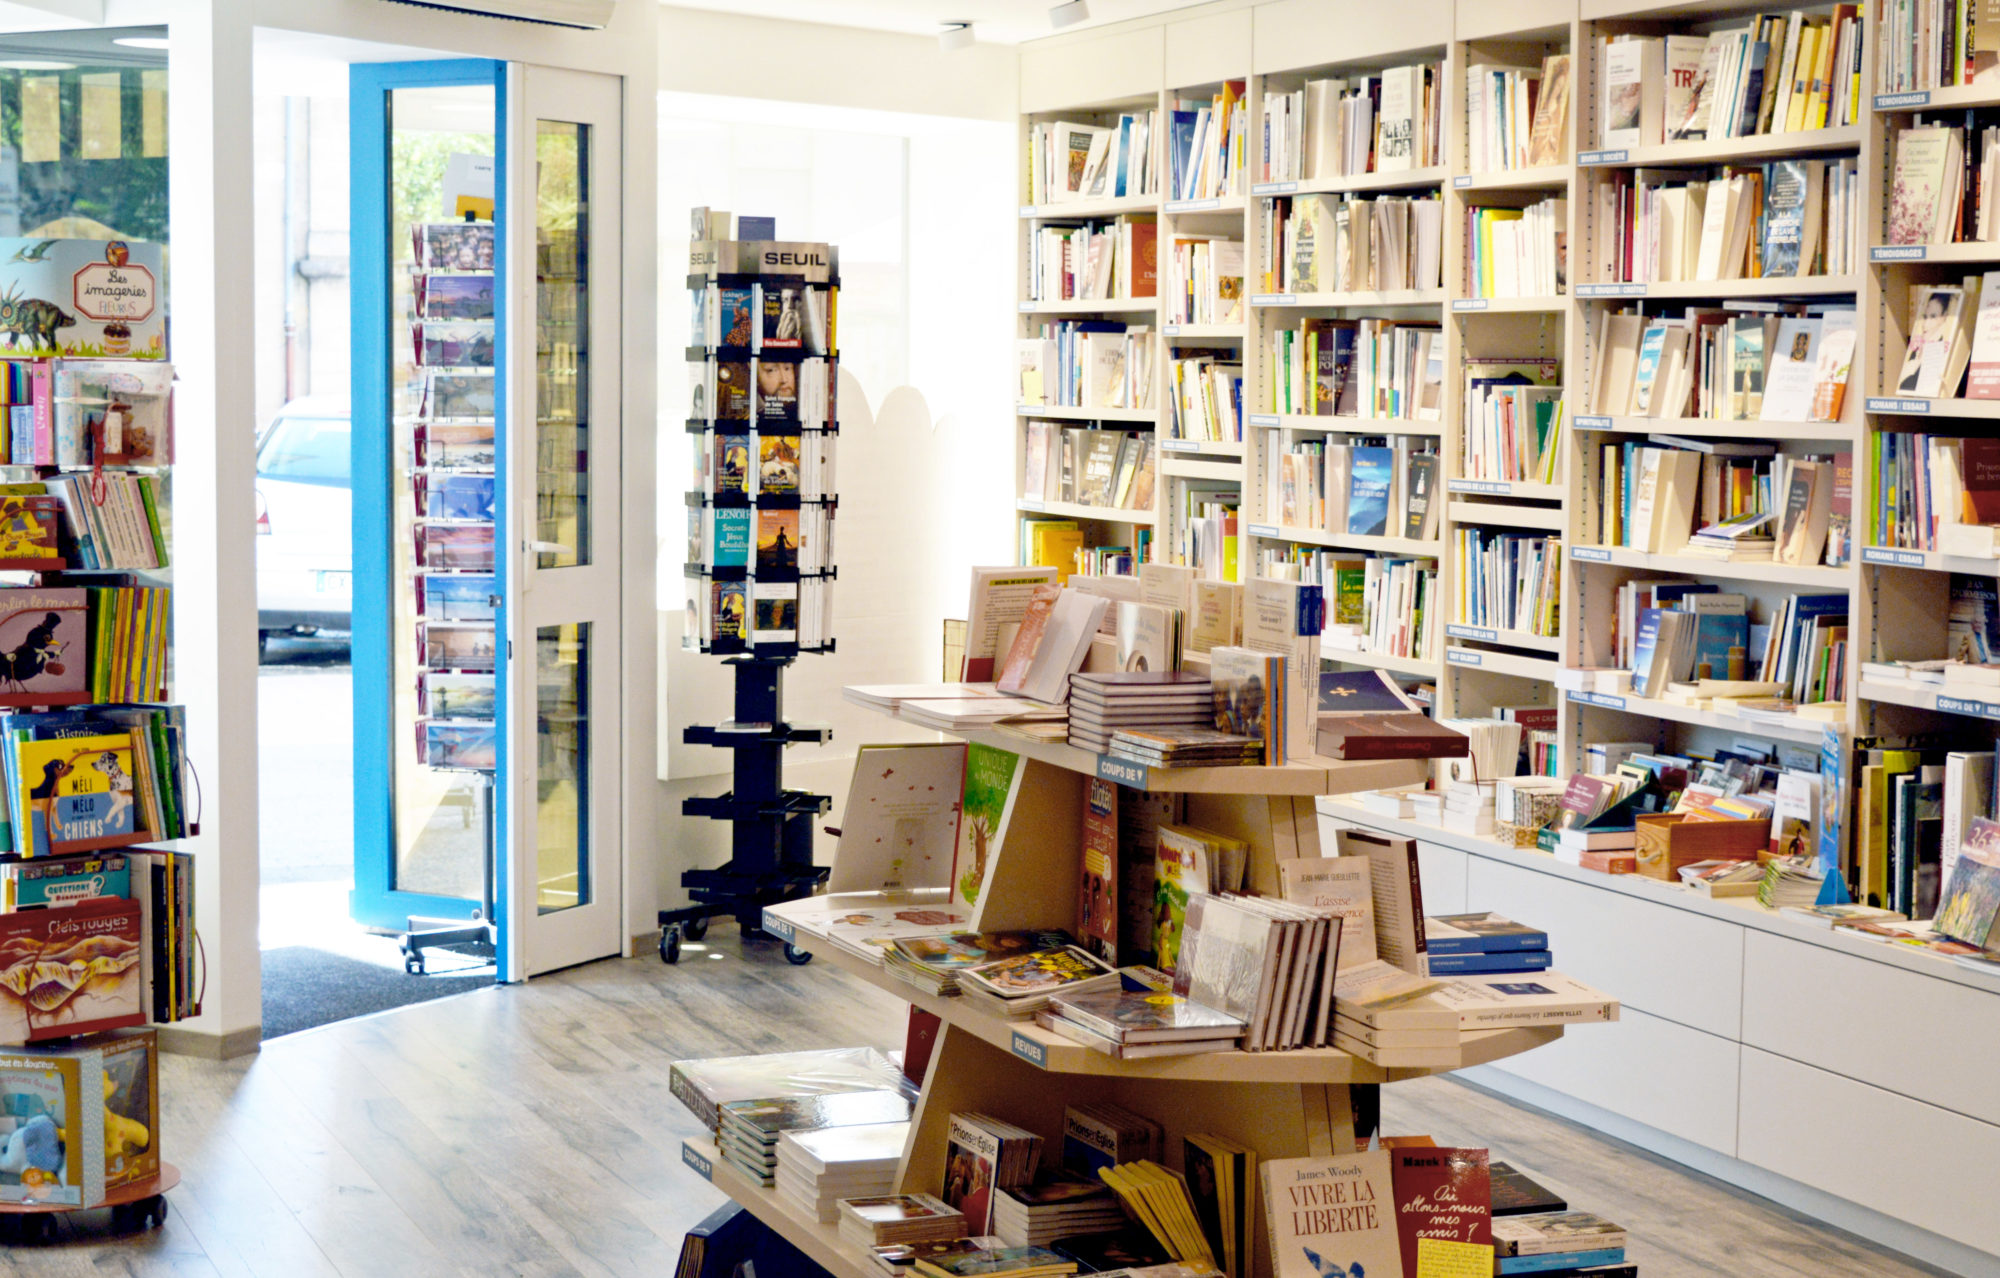 librairie art et livre 02